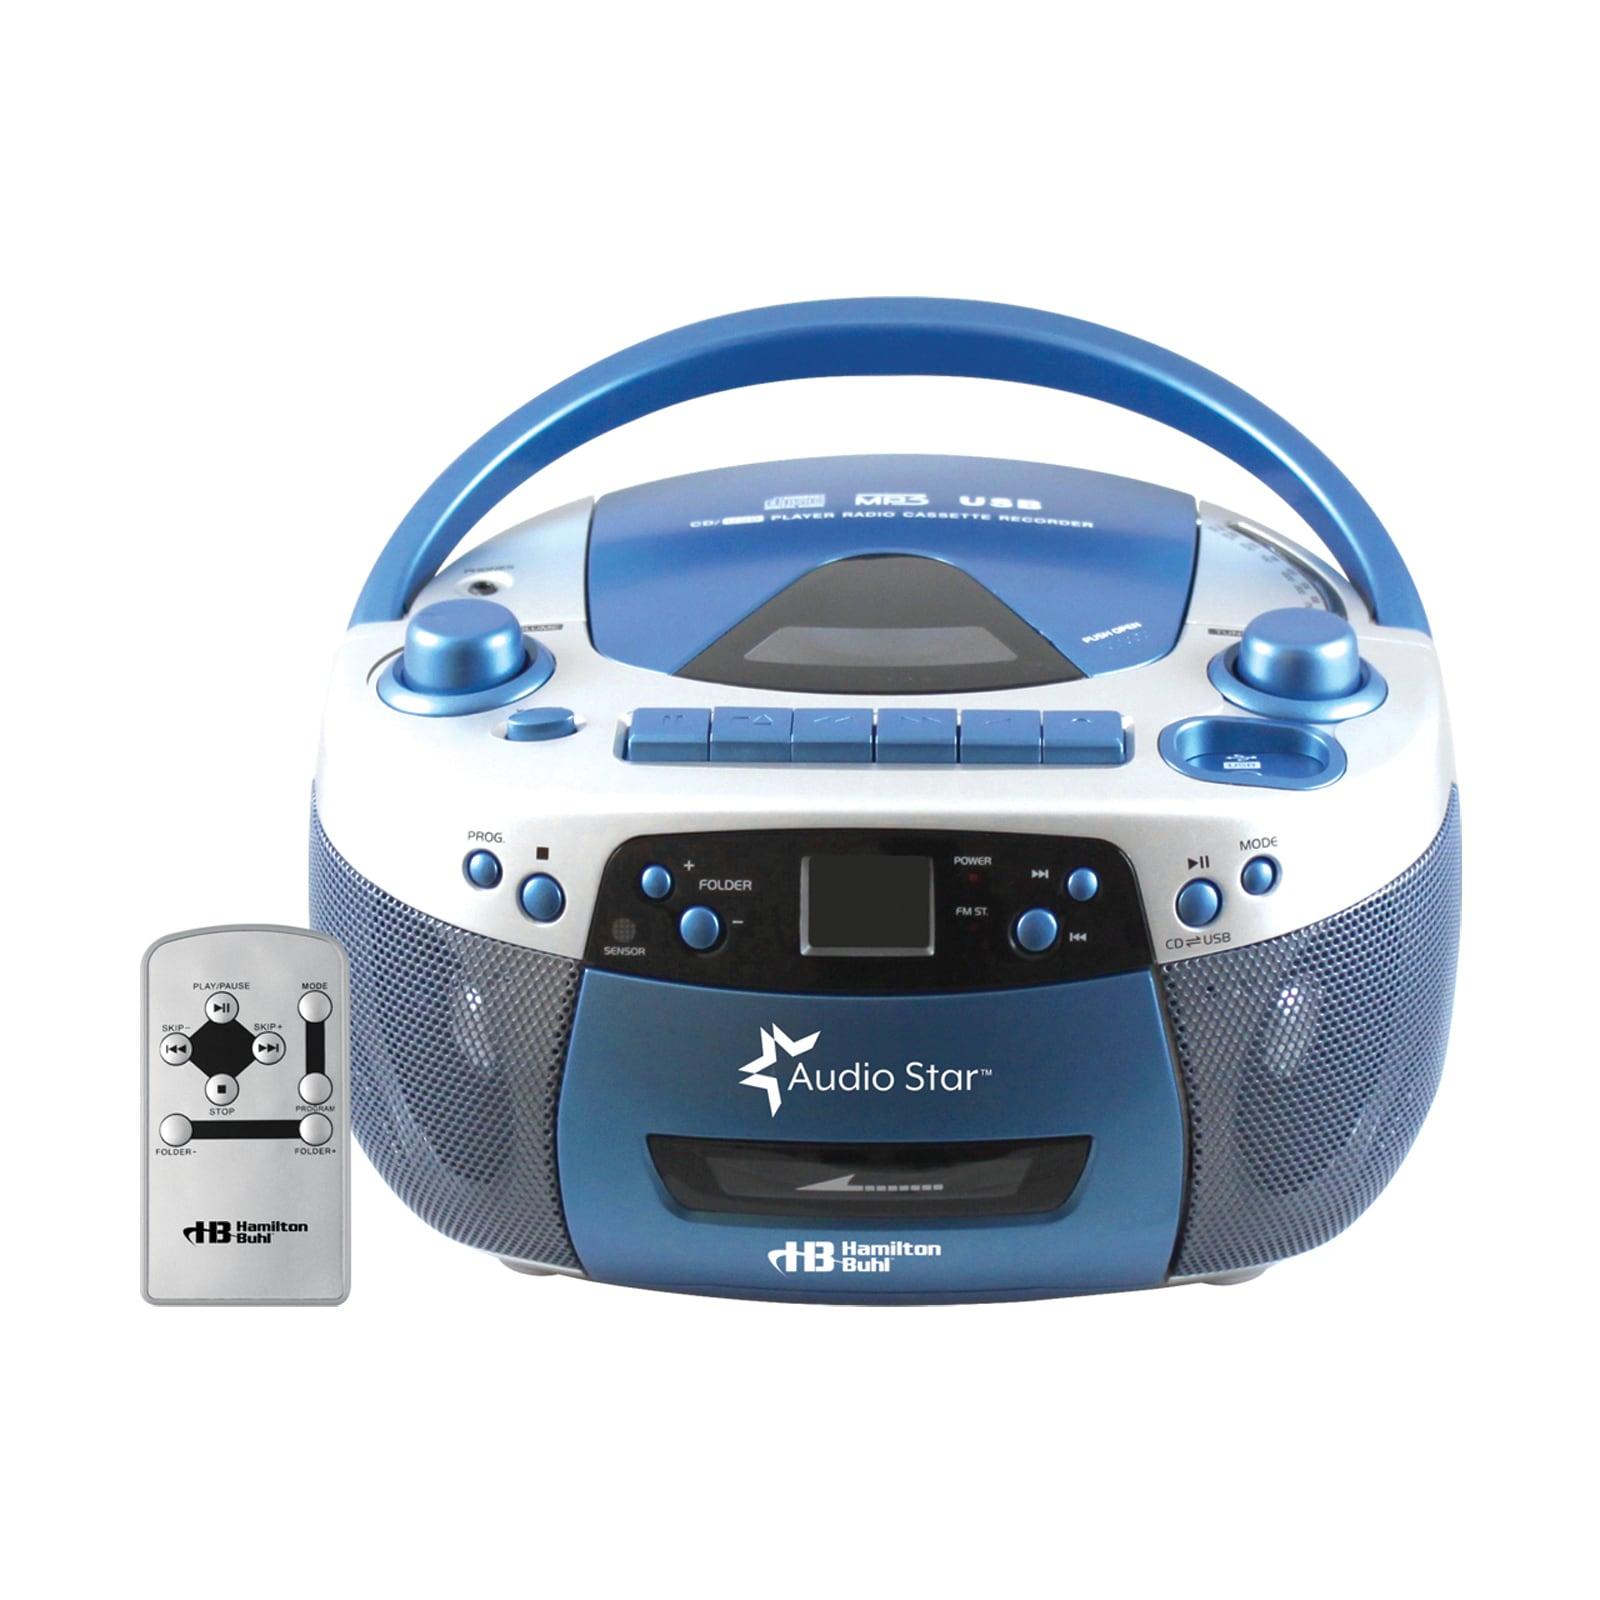 HAMILTON ELECTRONICS HamiltonBuhl AudioStar Boombox Radio...